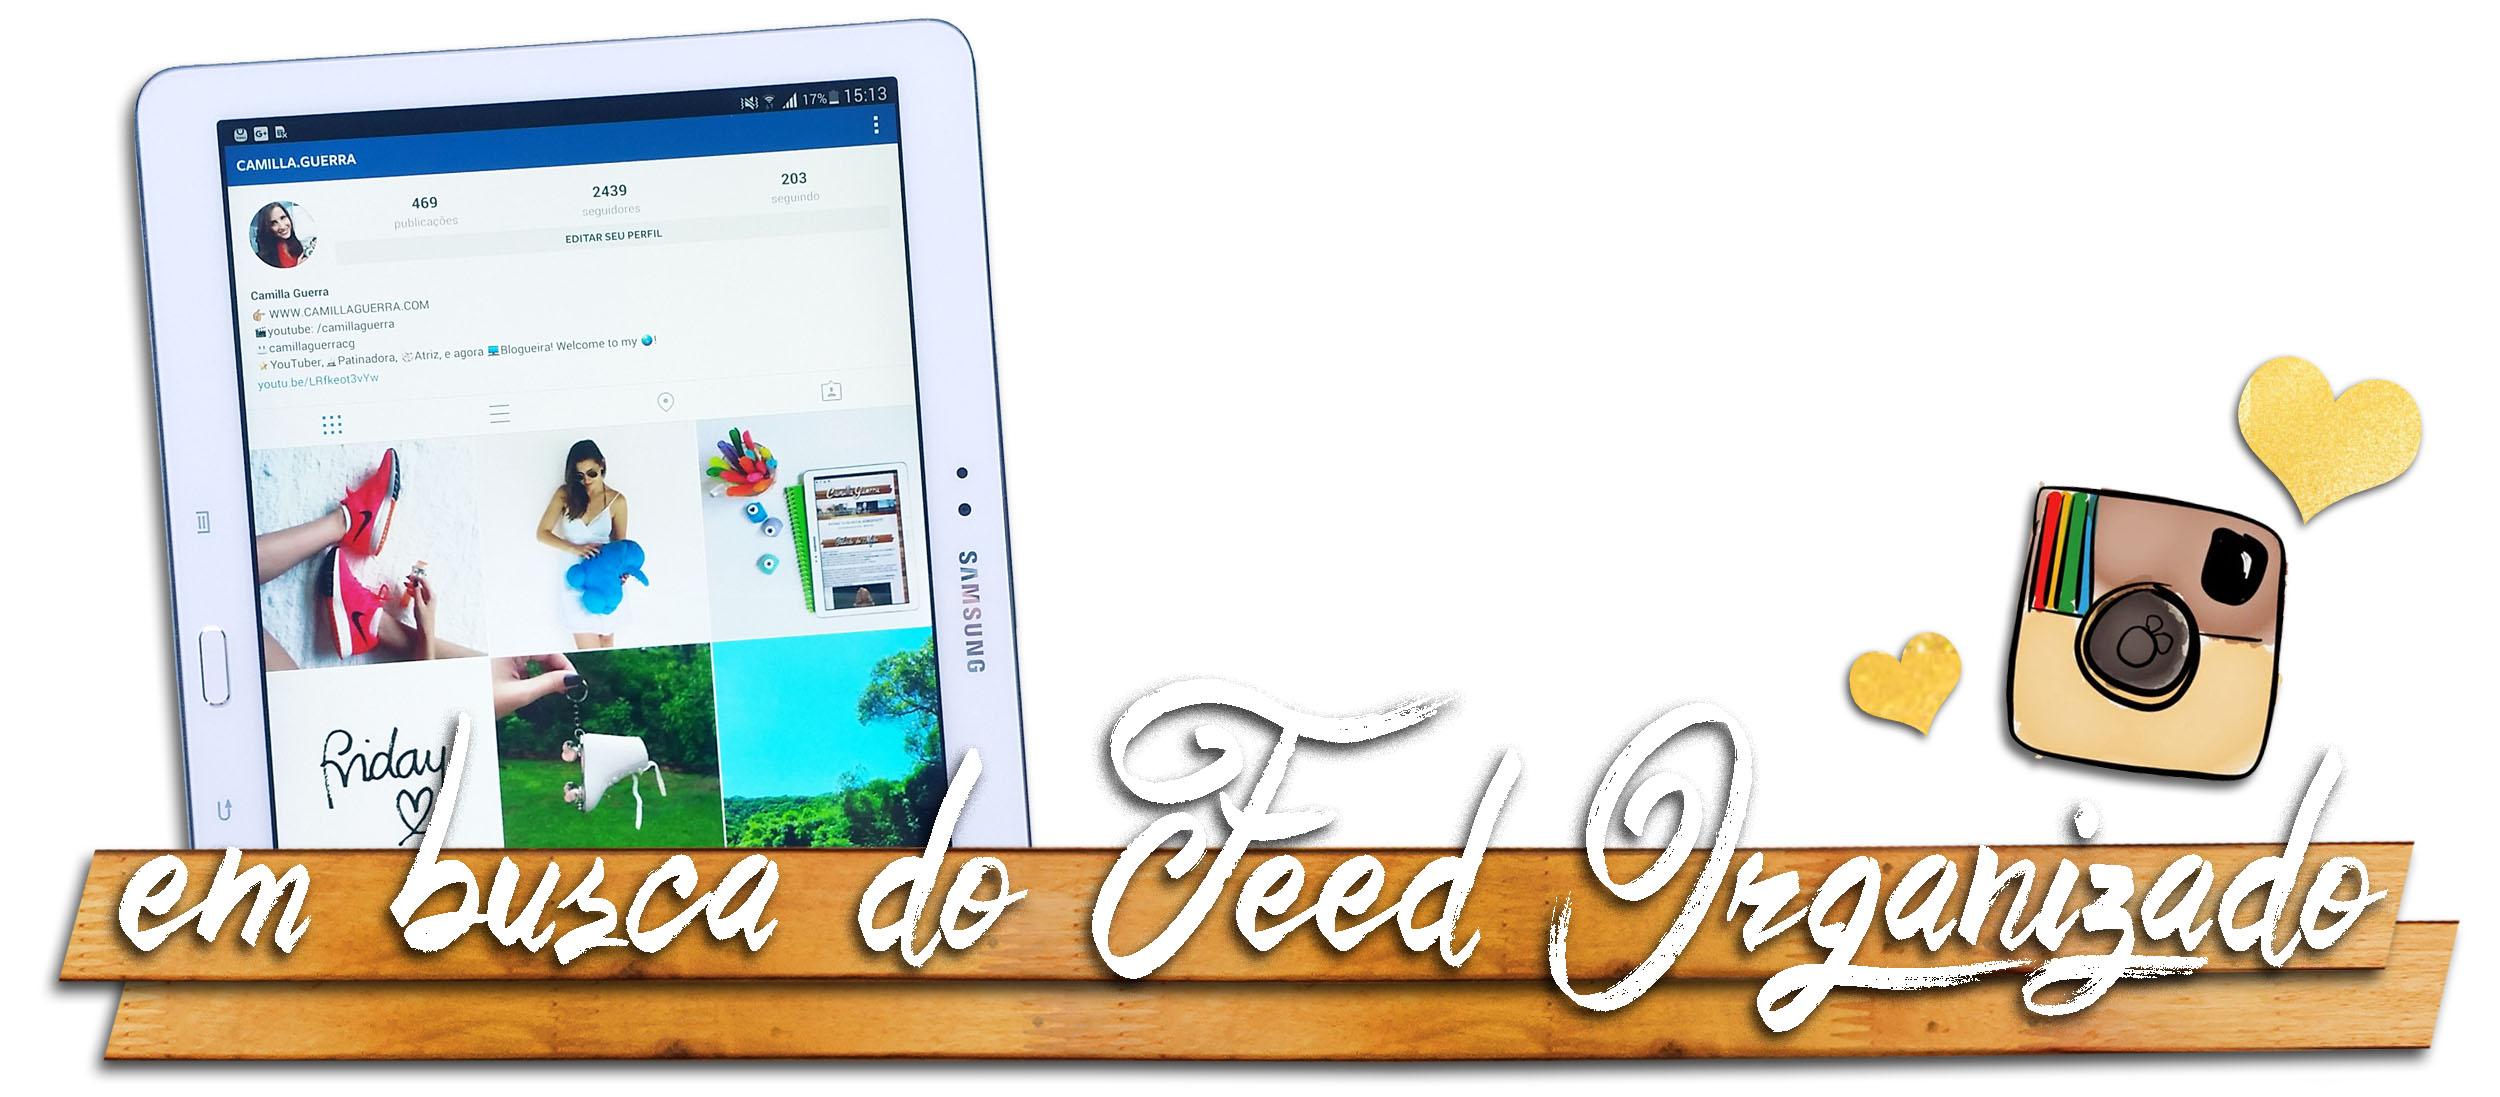 blog-camilla-guerra-instagram-feed-organizado-em-busca-do-feed-perfeito